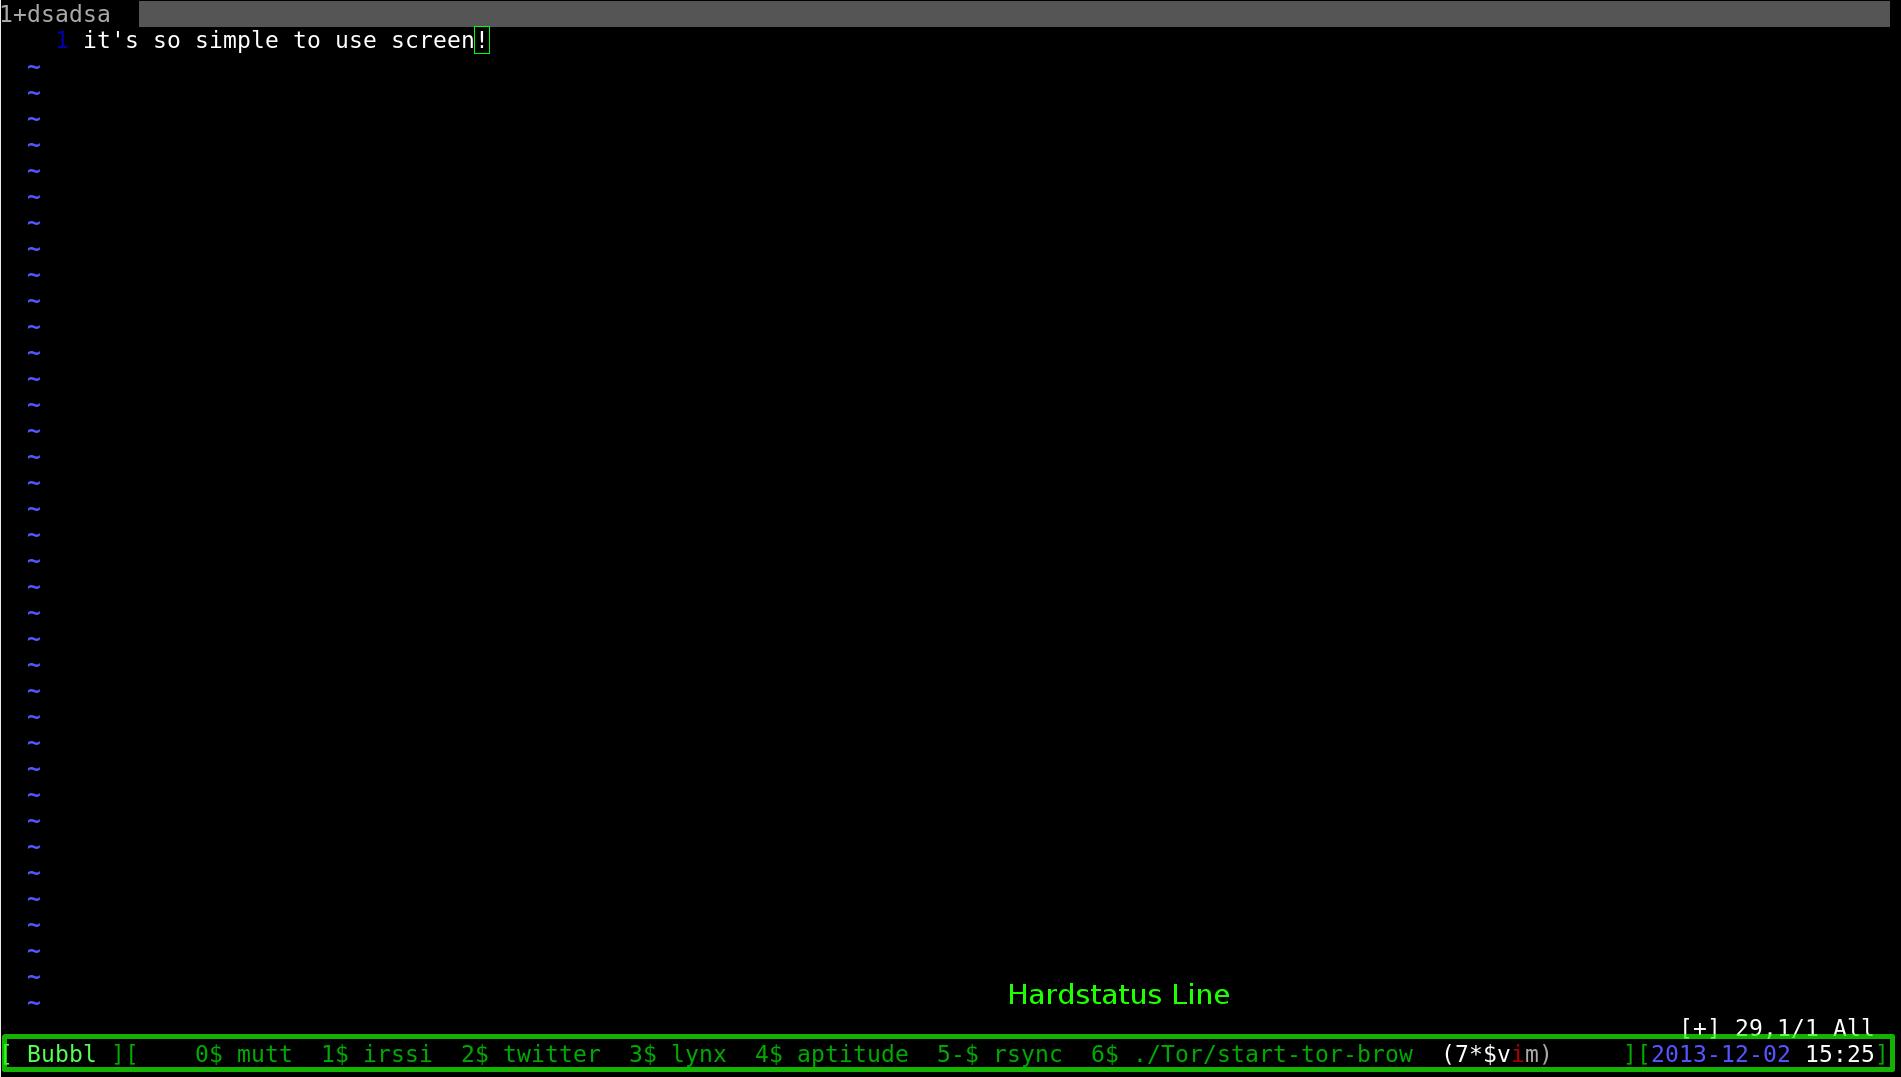 screen hardstatus